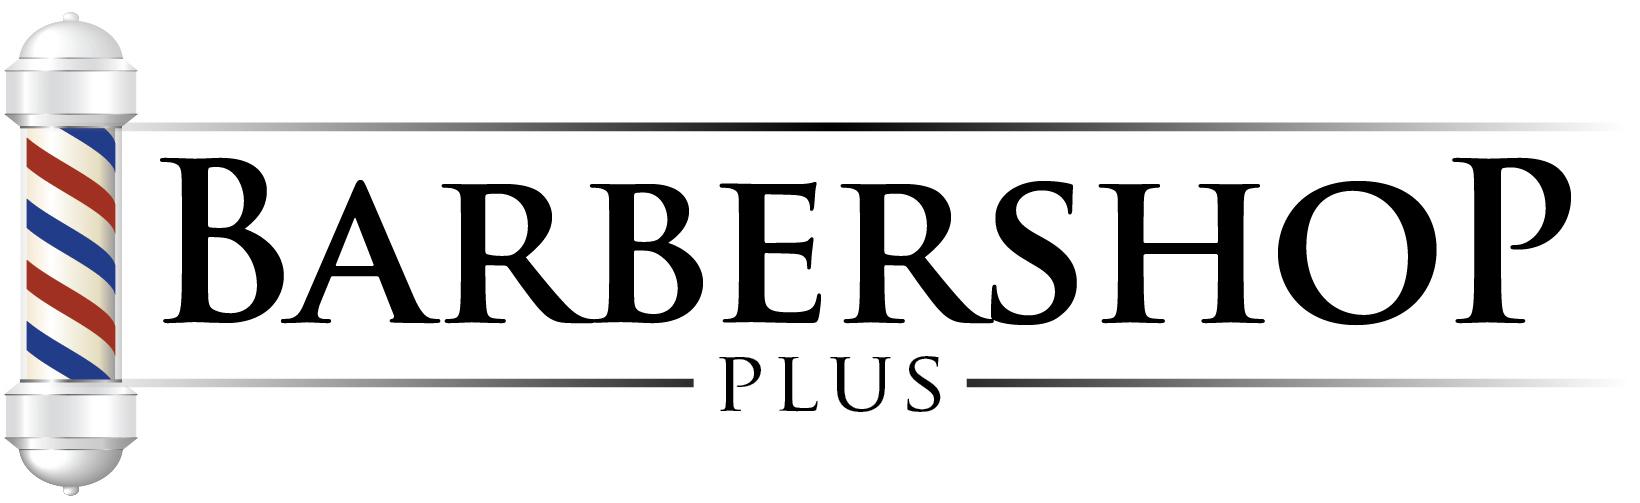 BarberShop Plus Logo